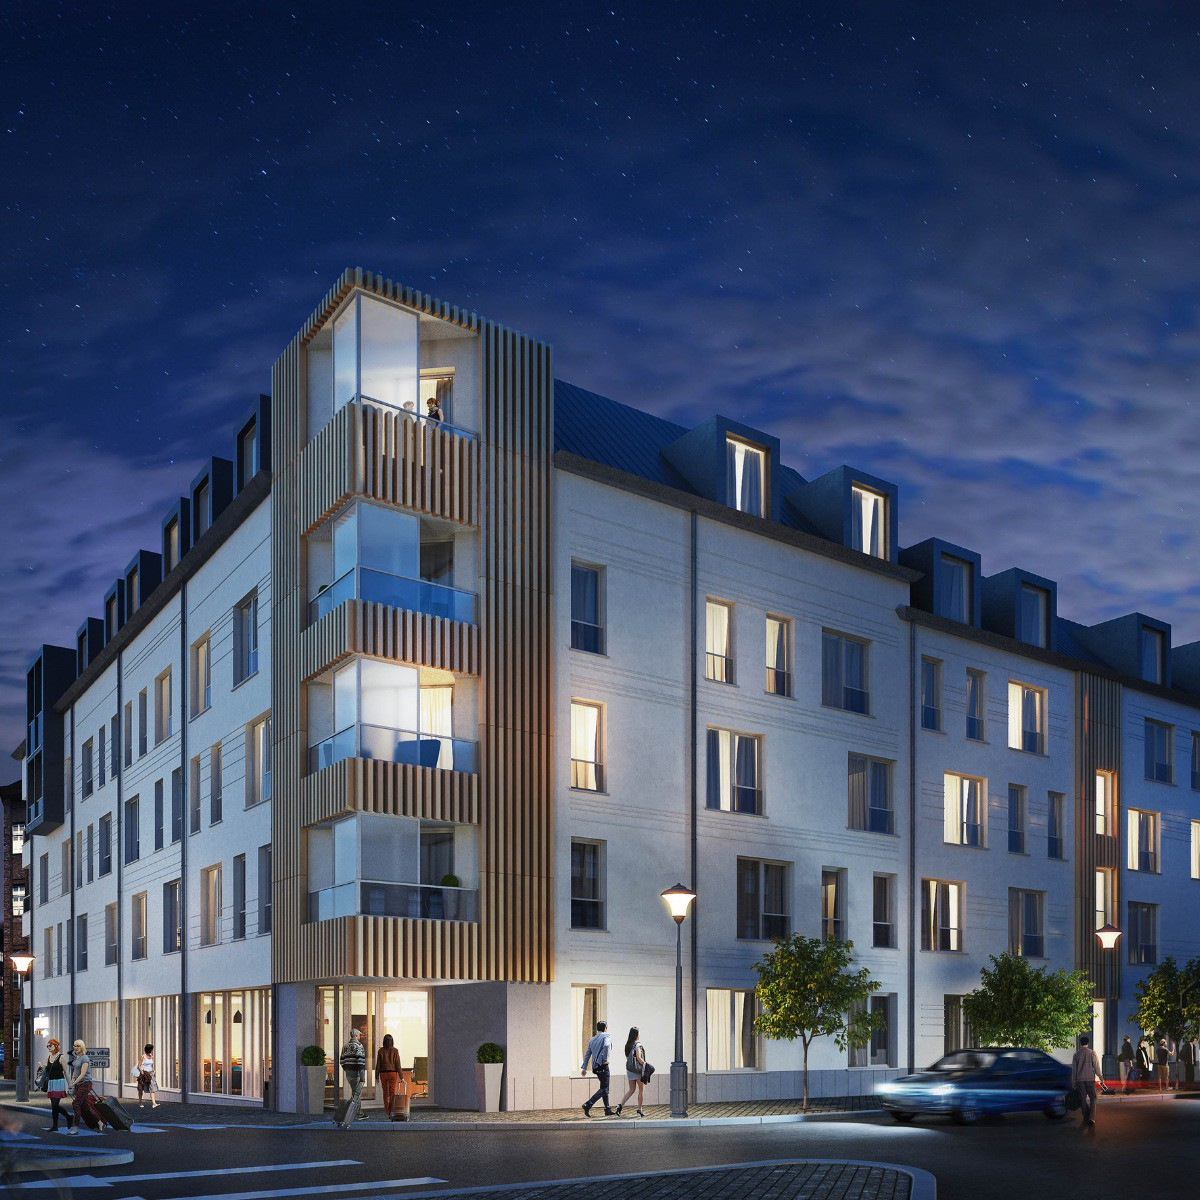 Radisson-Liège-Luik-Unibricks-Hotelvastgoed-Investering-Immobilier-Hôtelier-Investissement-2